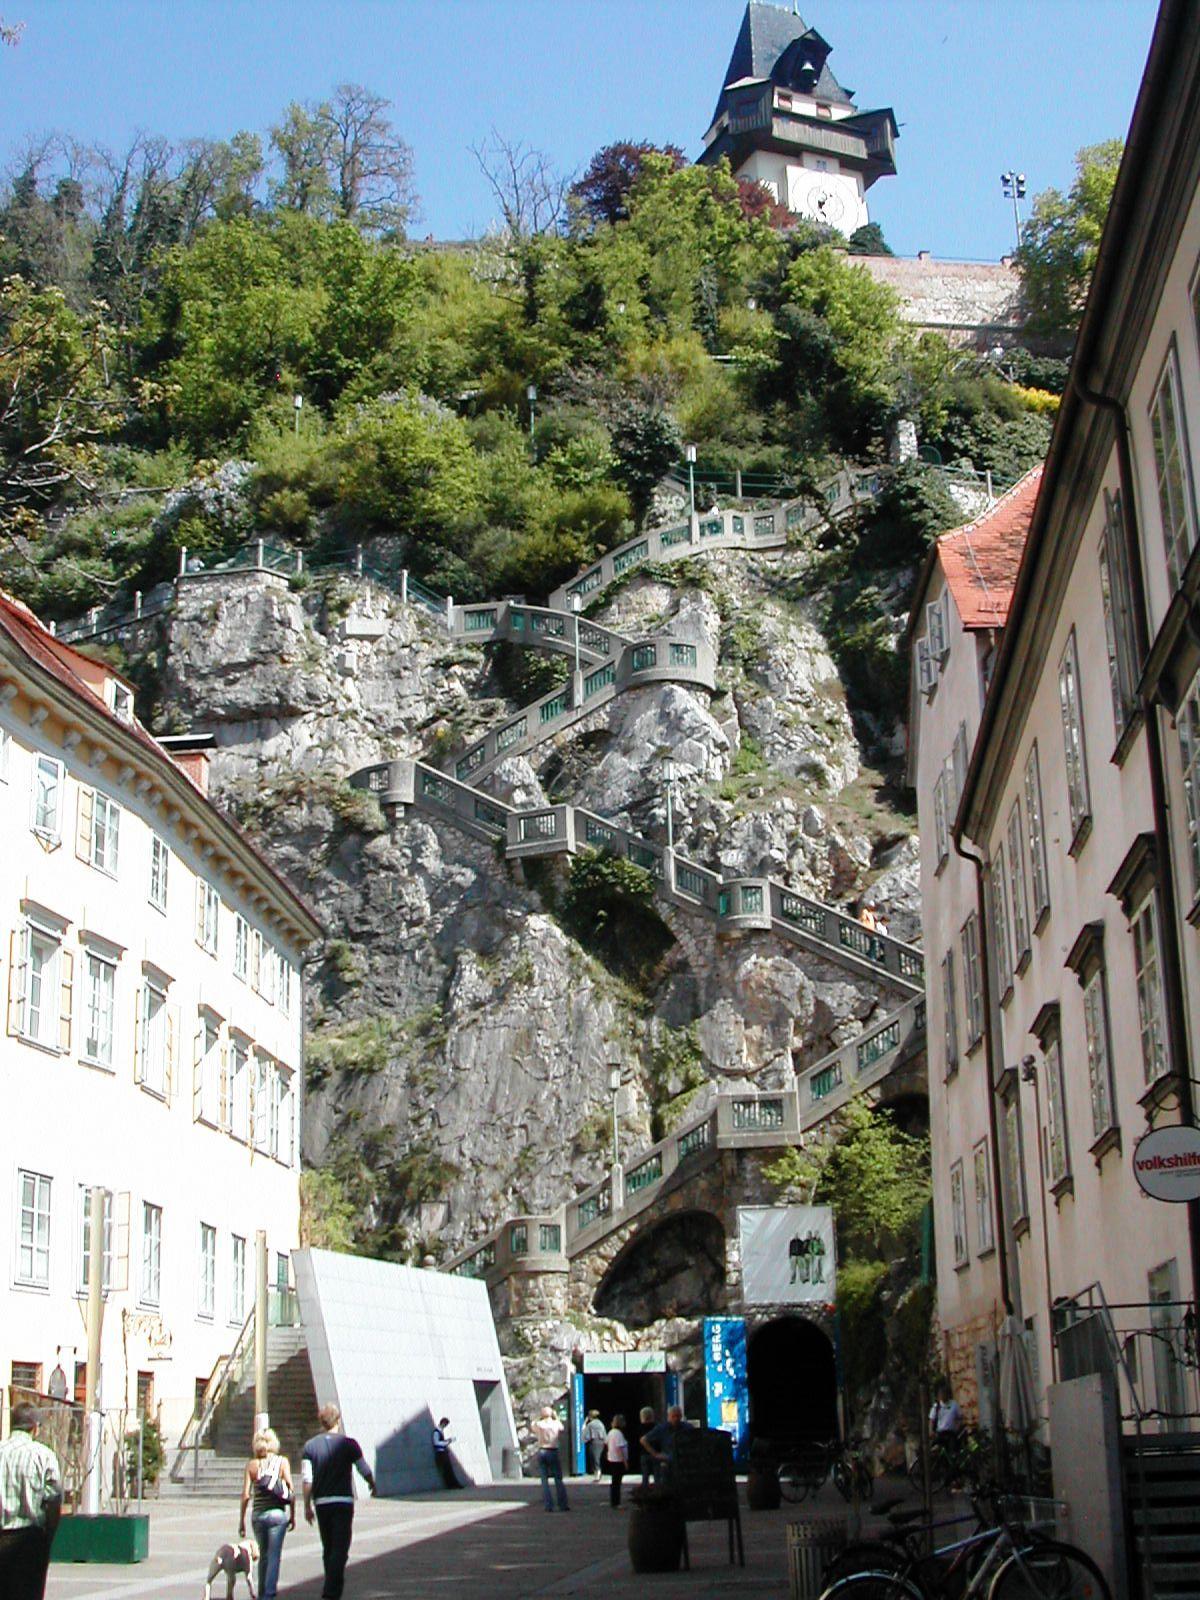 Https Upload Wikimedia Org Wikipedia Commons 2 25 Grazer Schlossberg Kriegssteig Jpg Styria Graz Places To Travel